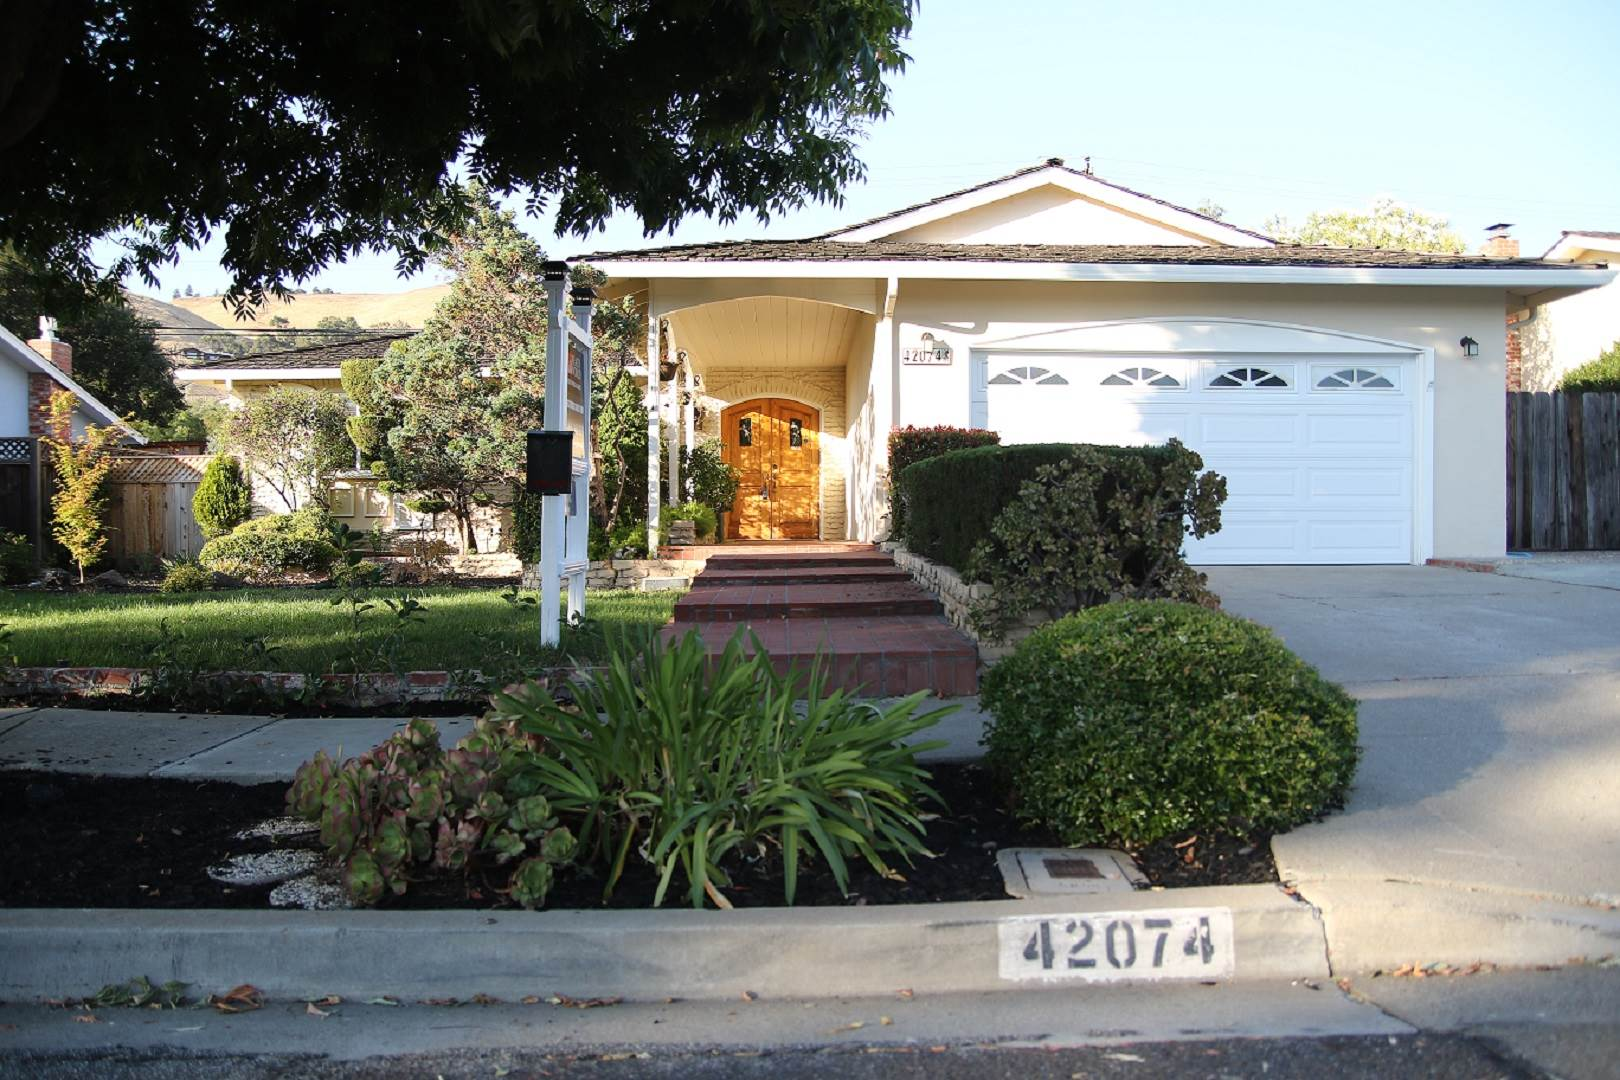 Photo of 42074 Via San Gabriel  Fremont  CA